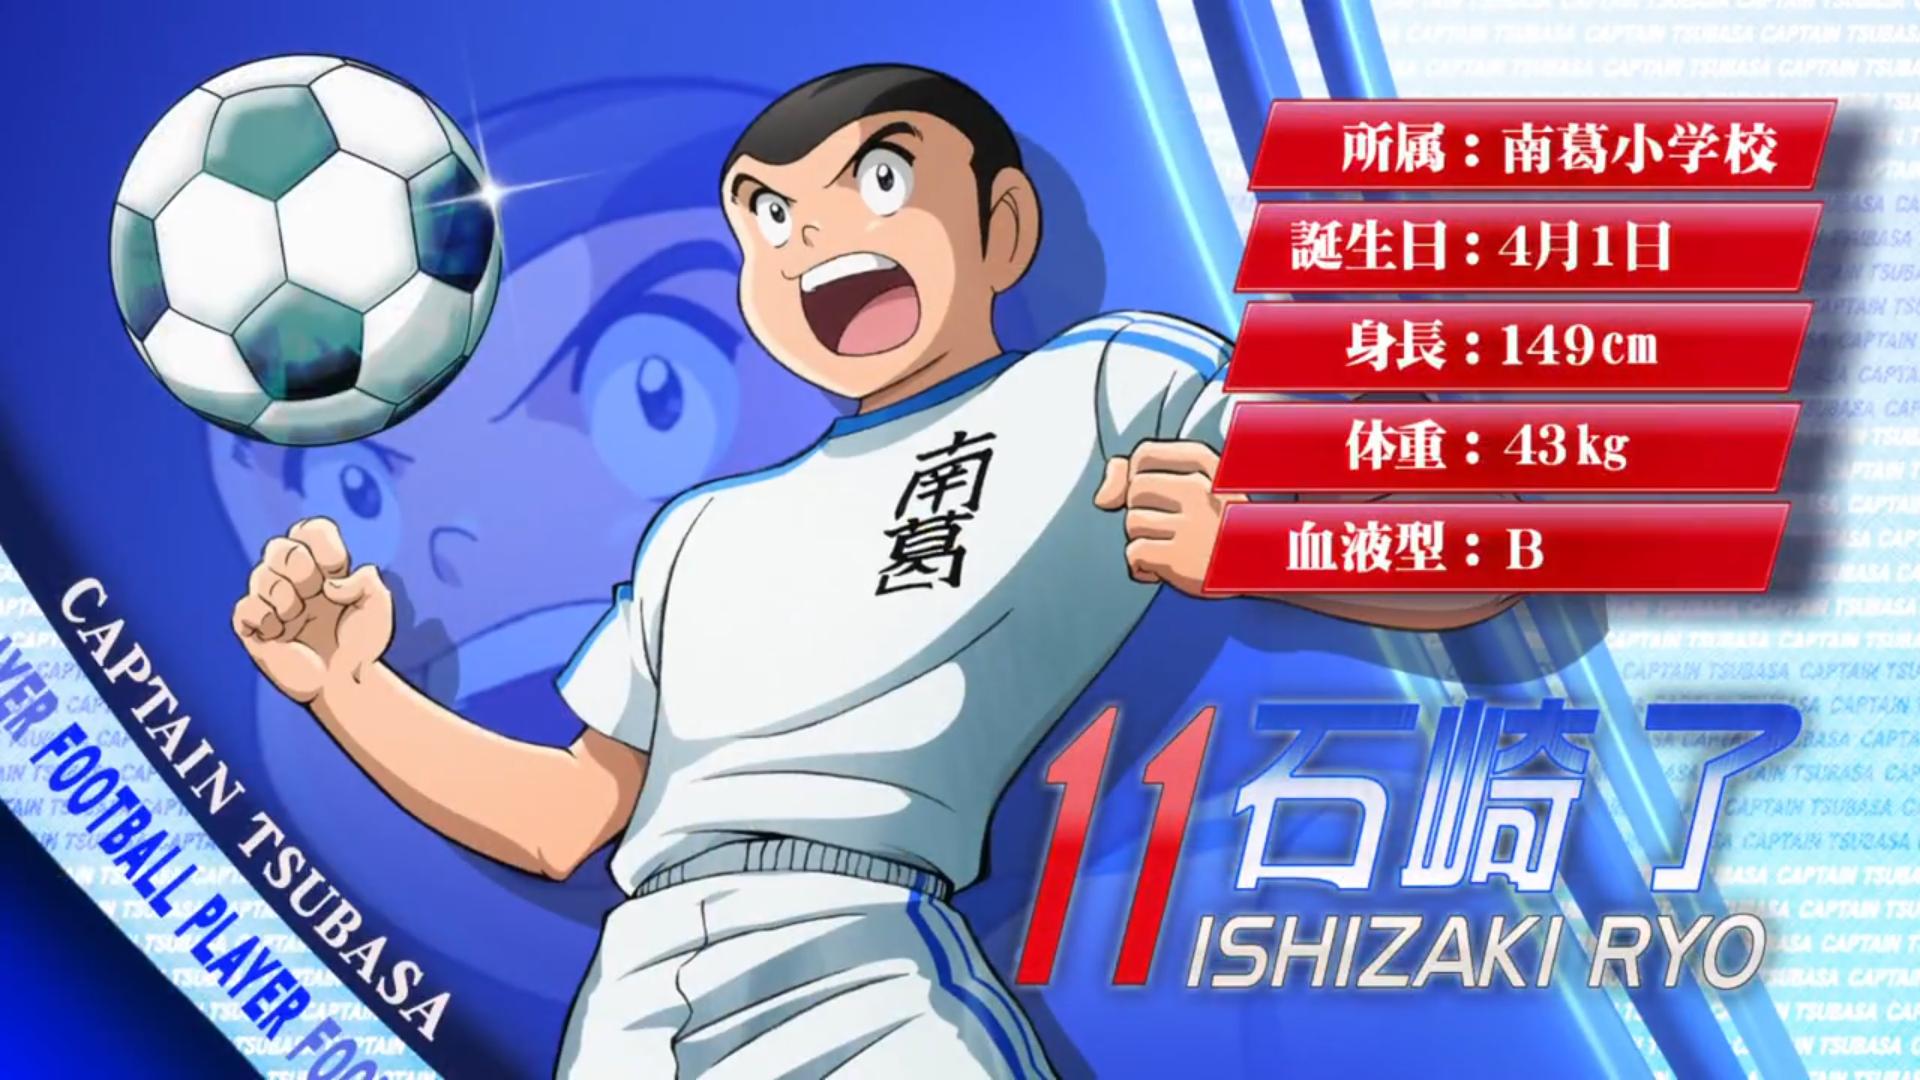 Ishizaki Ryo 2018 Anime Pinterest Captain Tsubasa Dragon